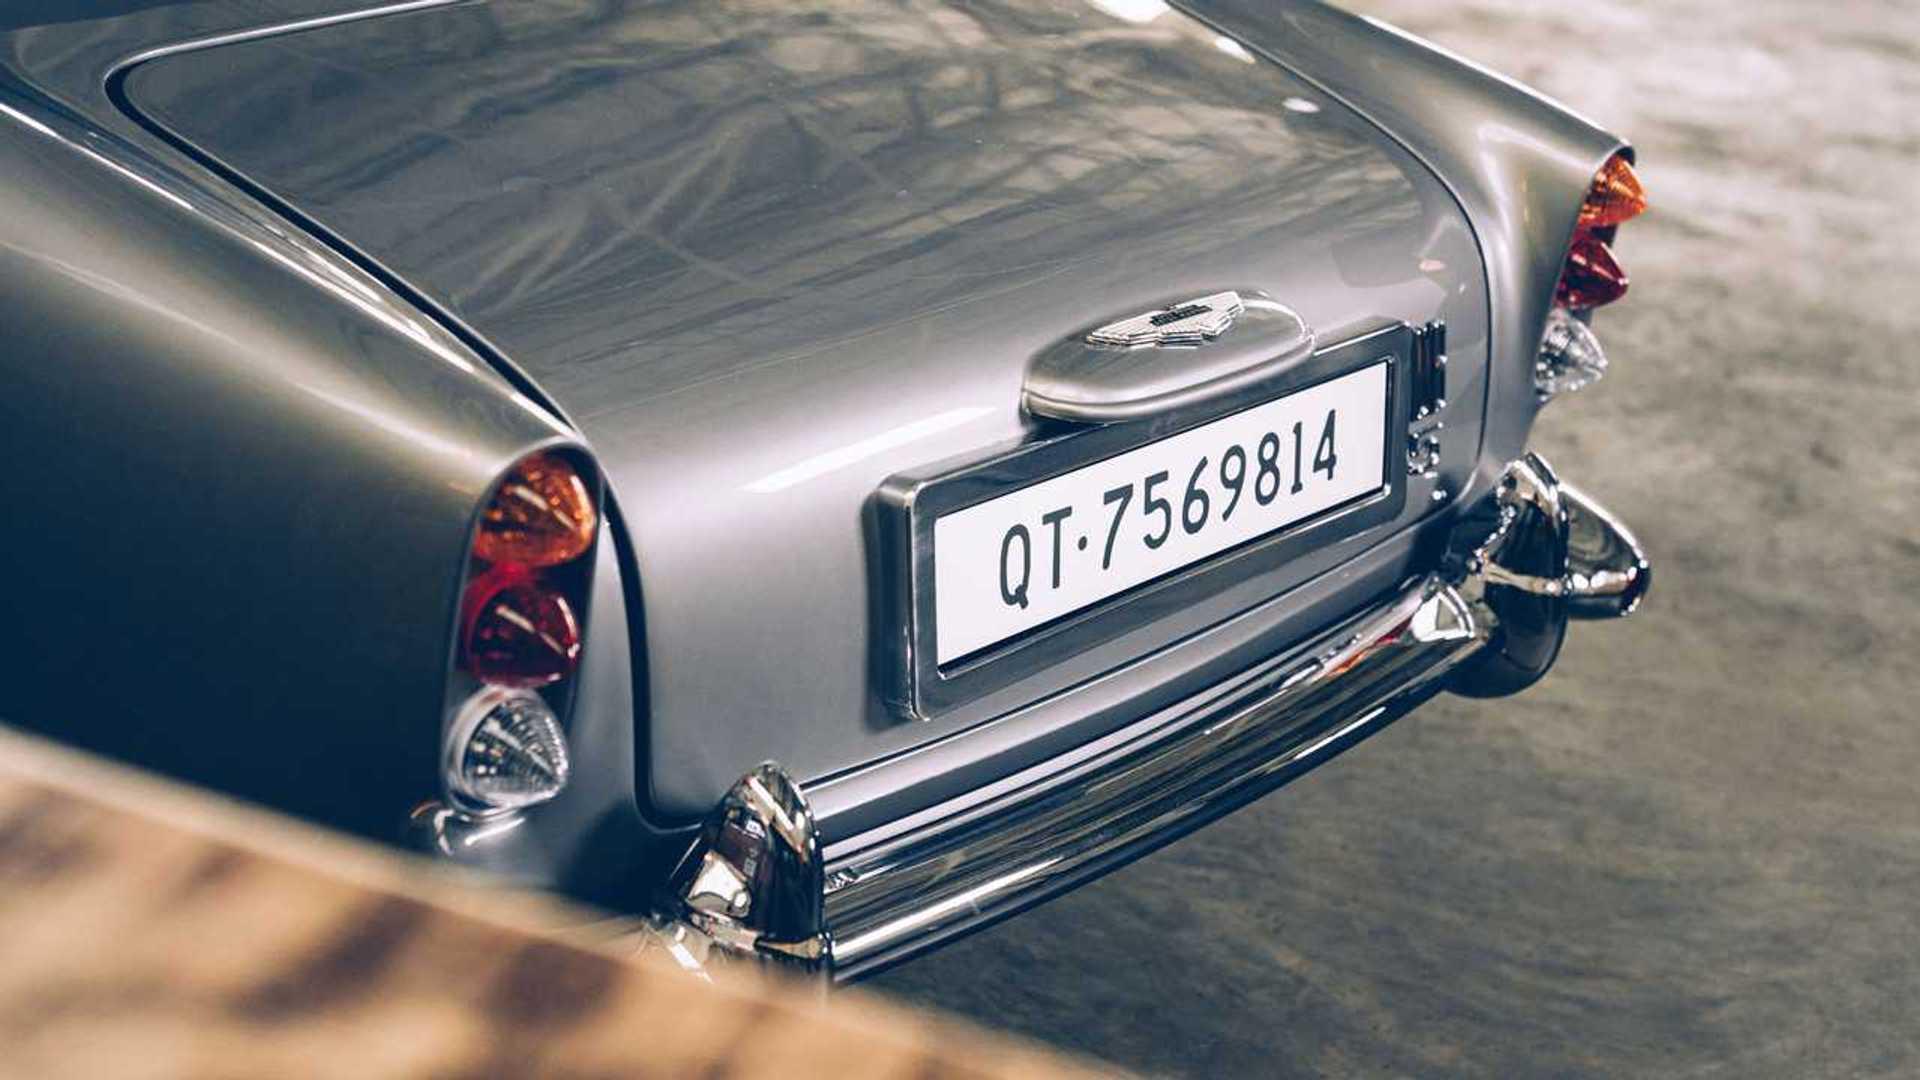 https://cdn.motor1.com/images/mgl/EKzRz/s6/aston-martin-db5-junior-no-time-to-die-edition-rear.jpg